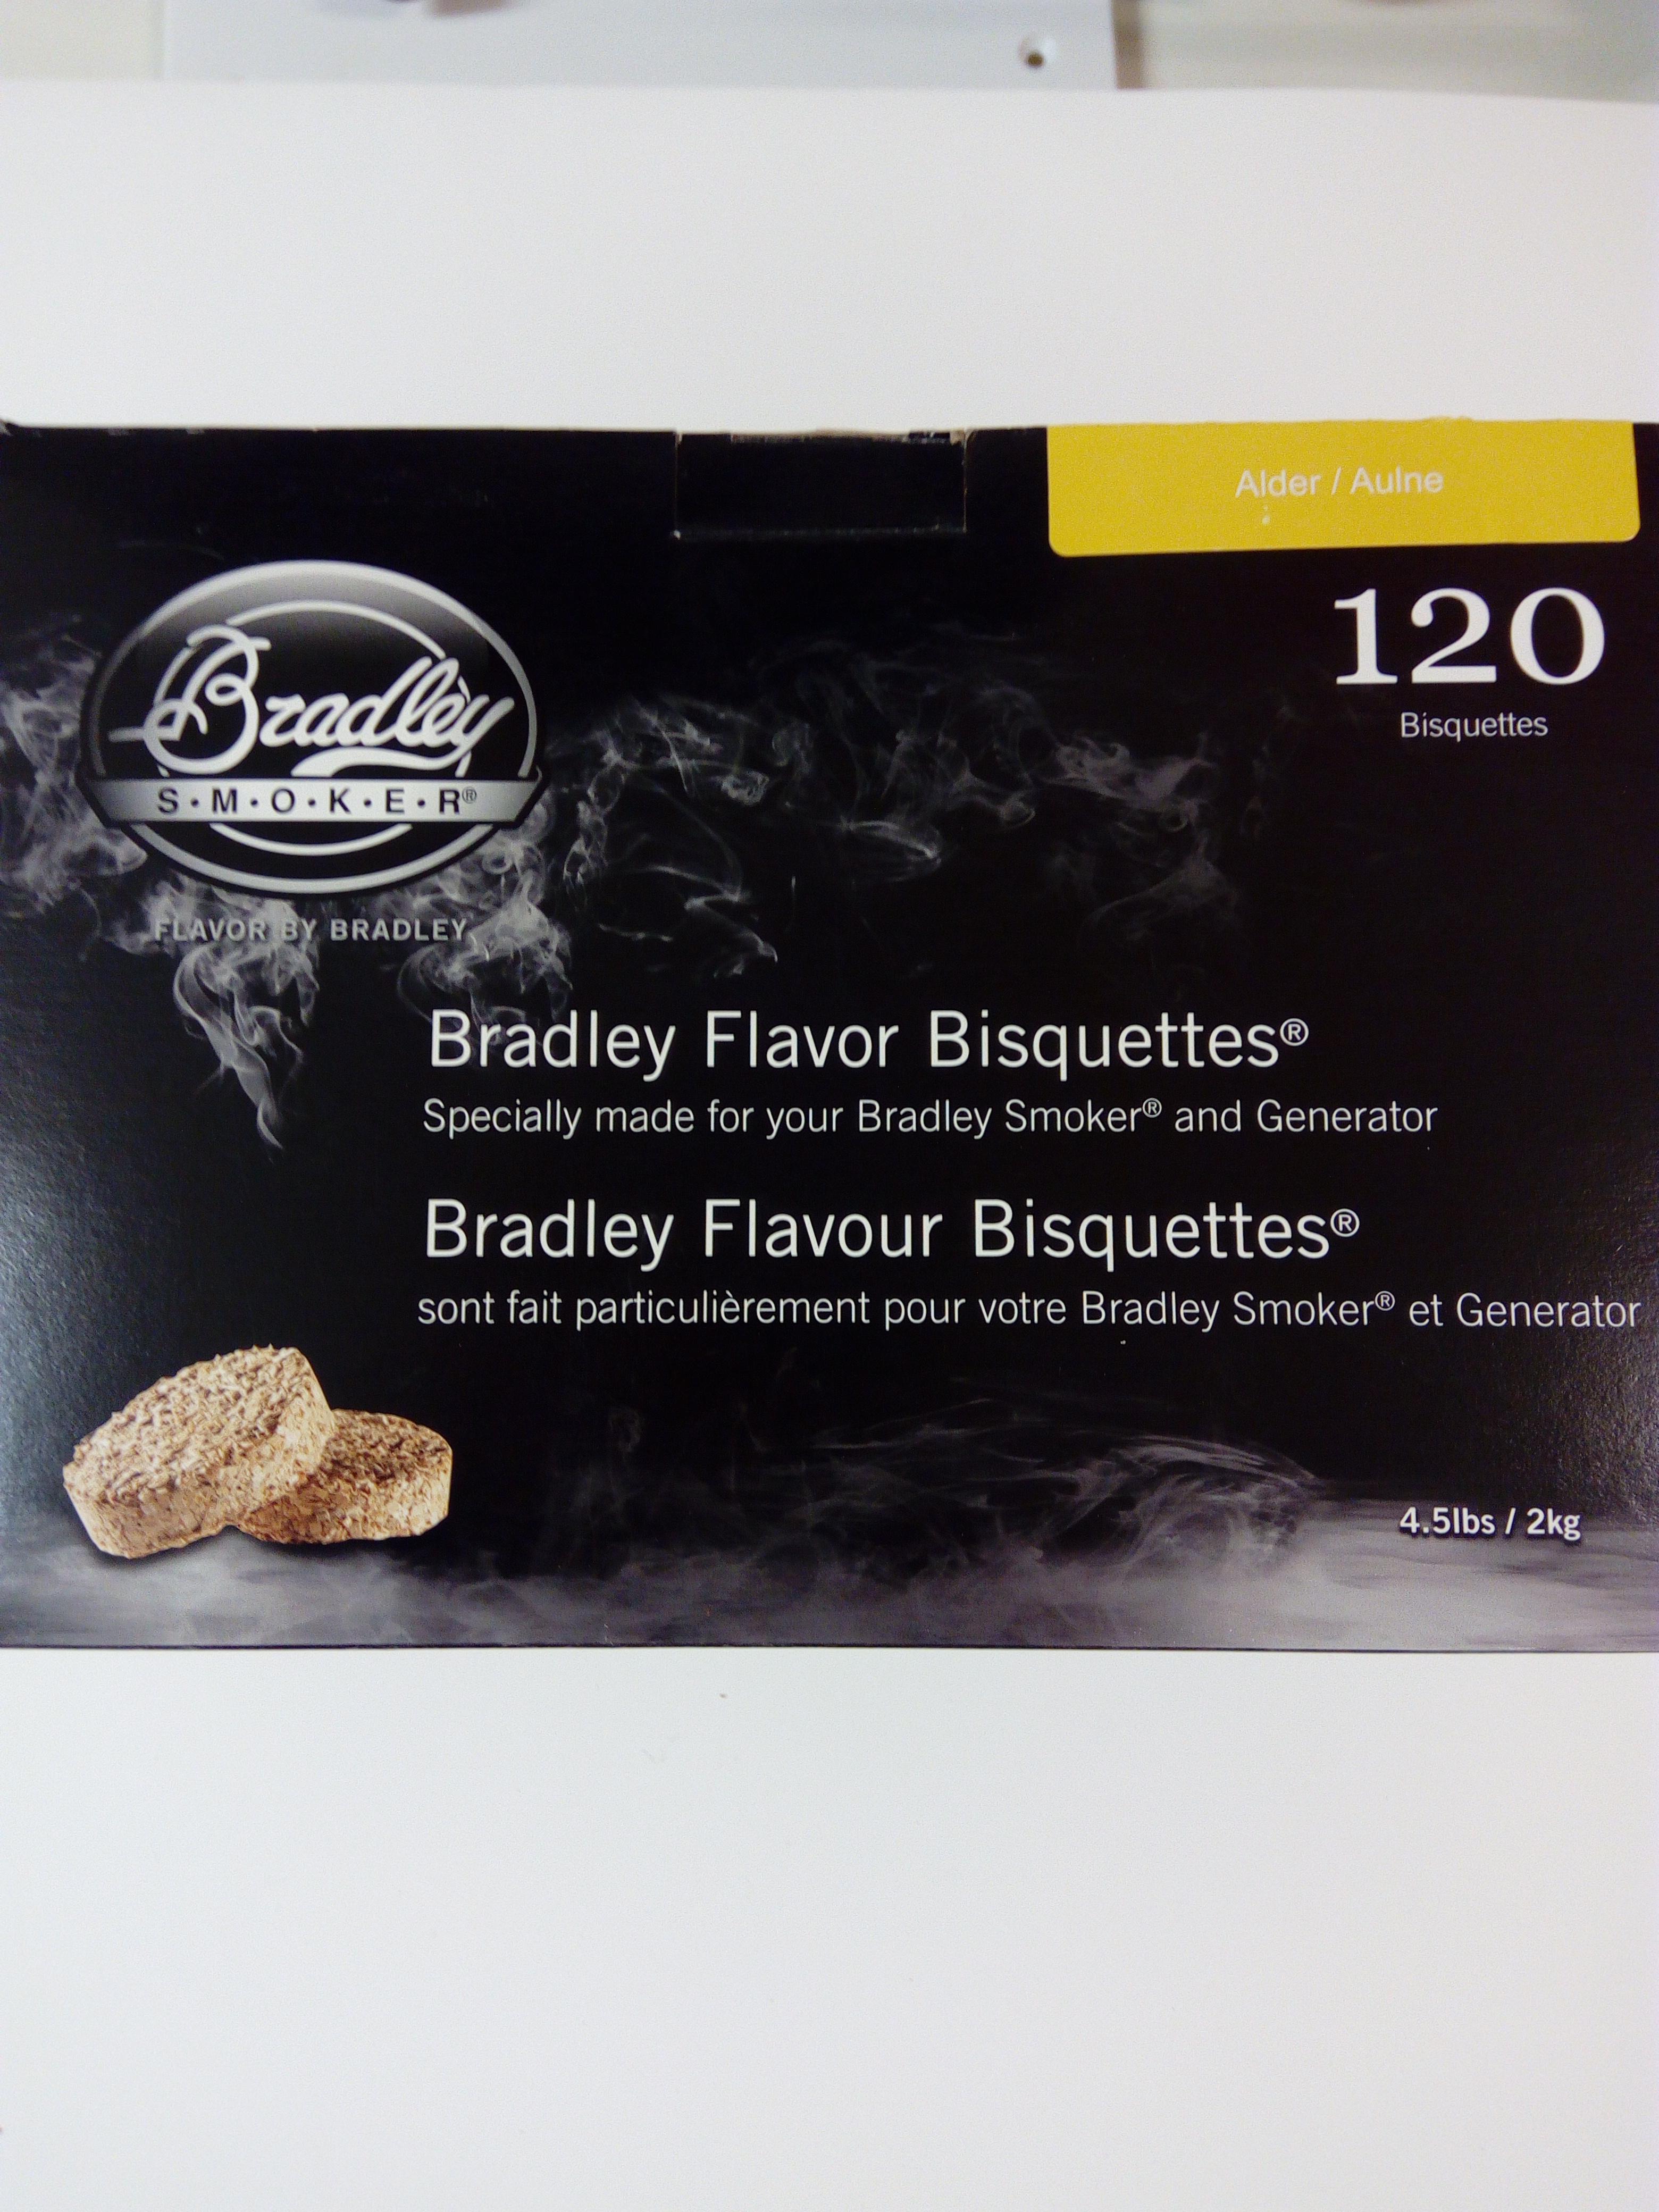 Bradley savustusbriketti Leppä (Alder) 120kpl/ltk